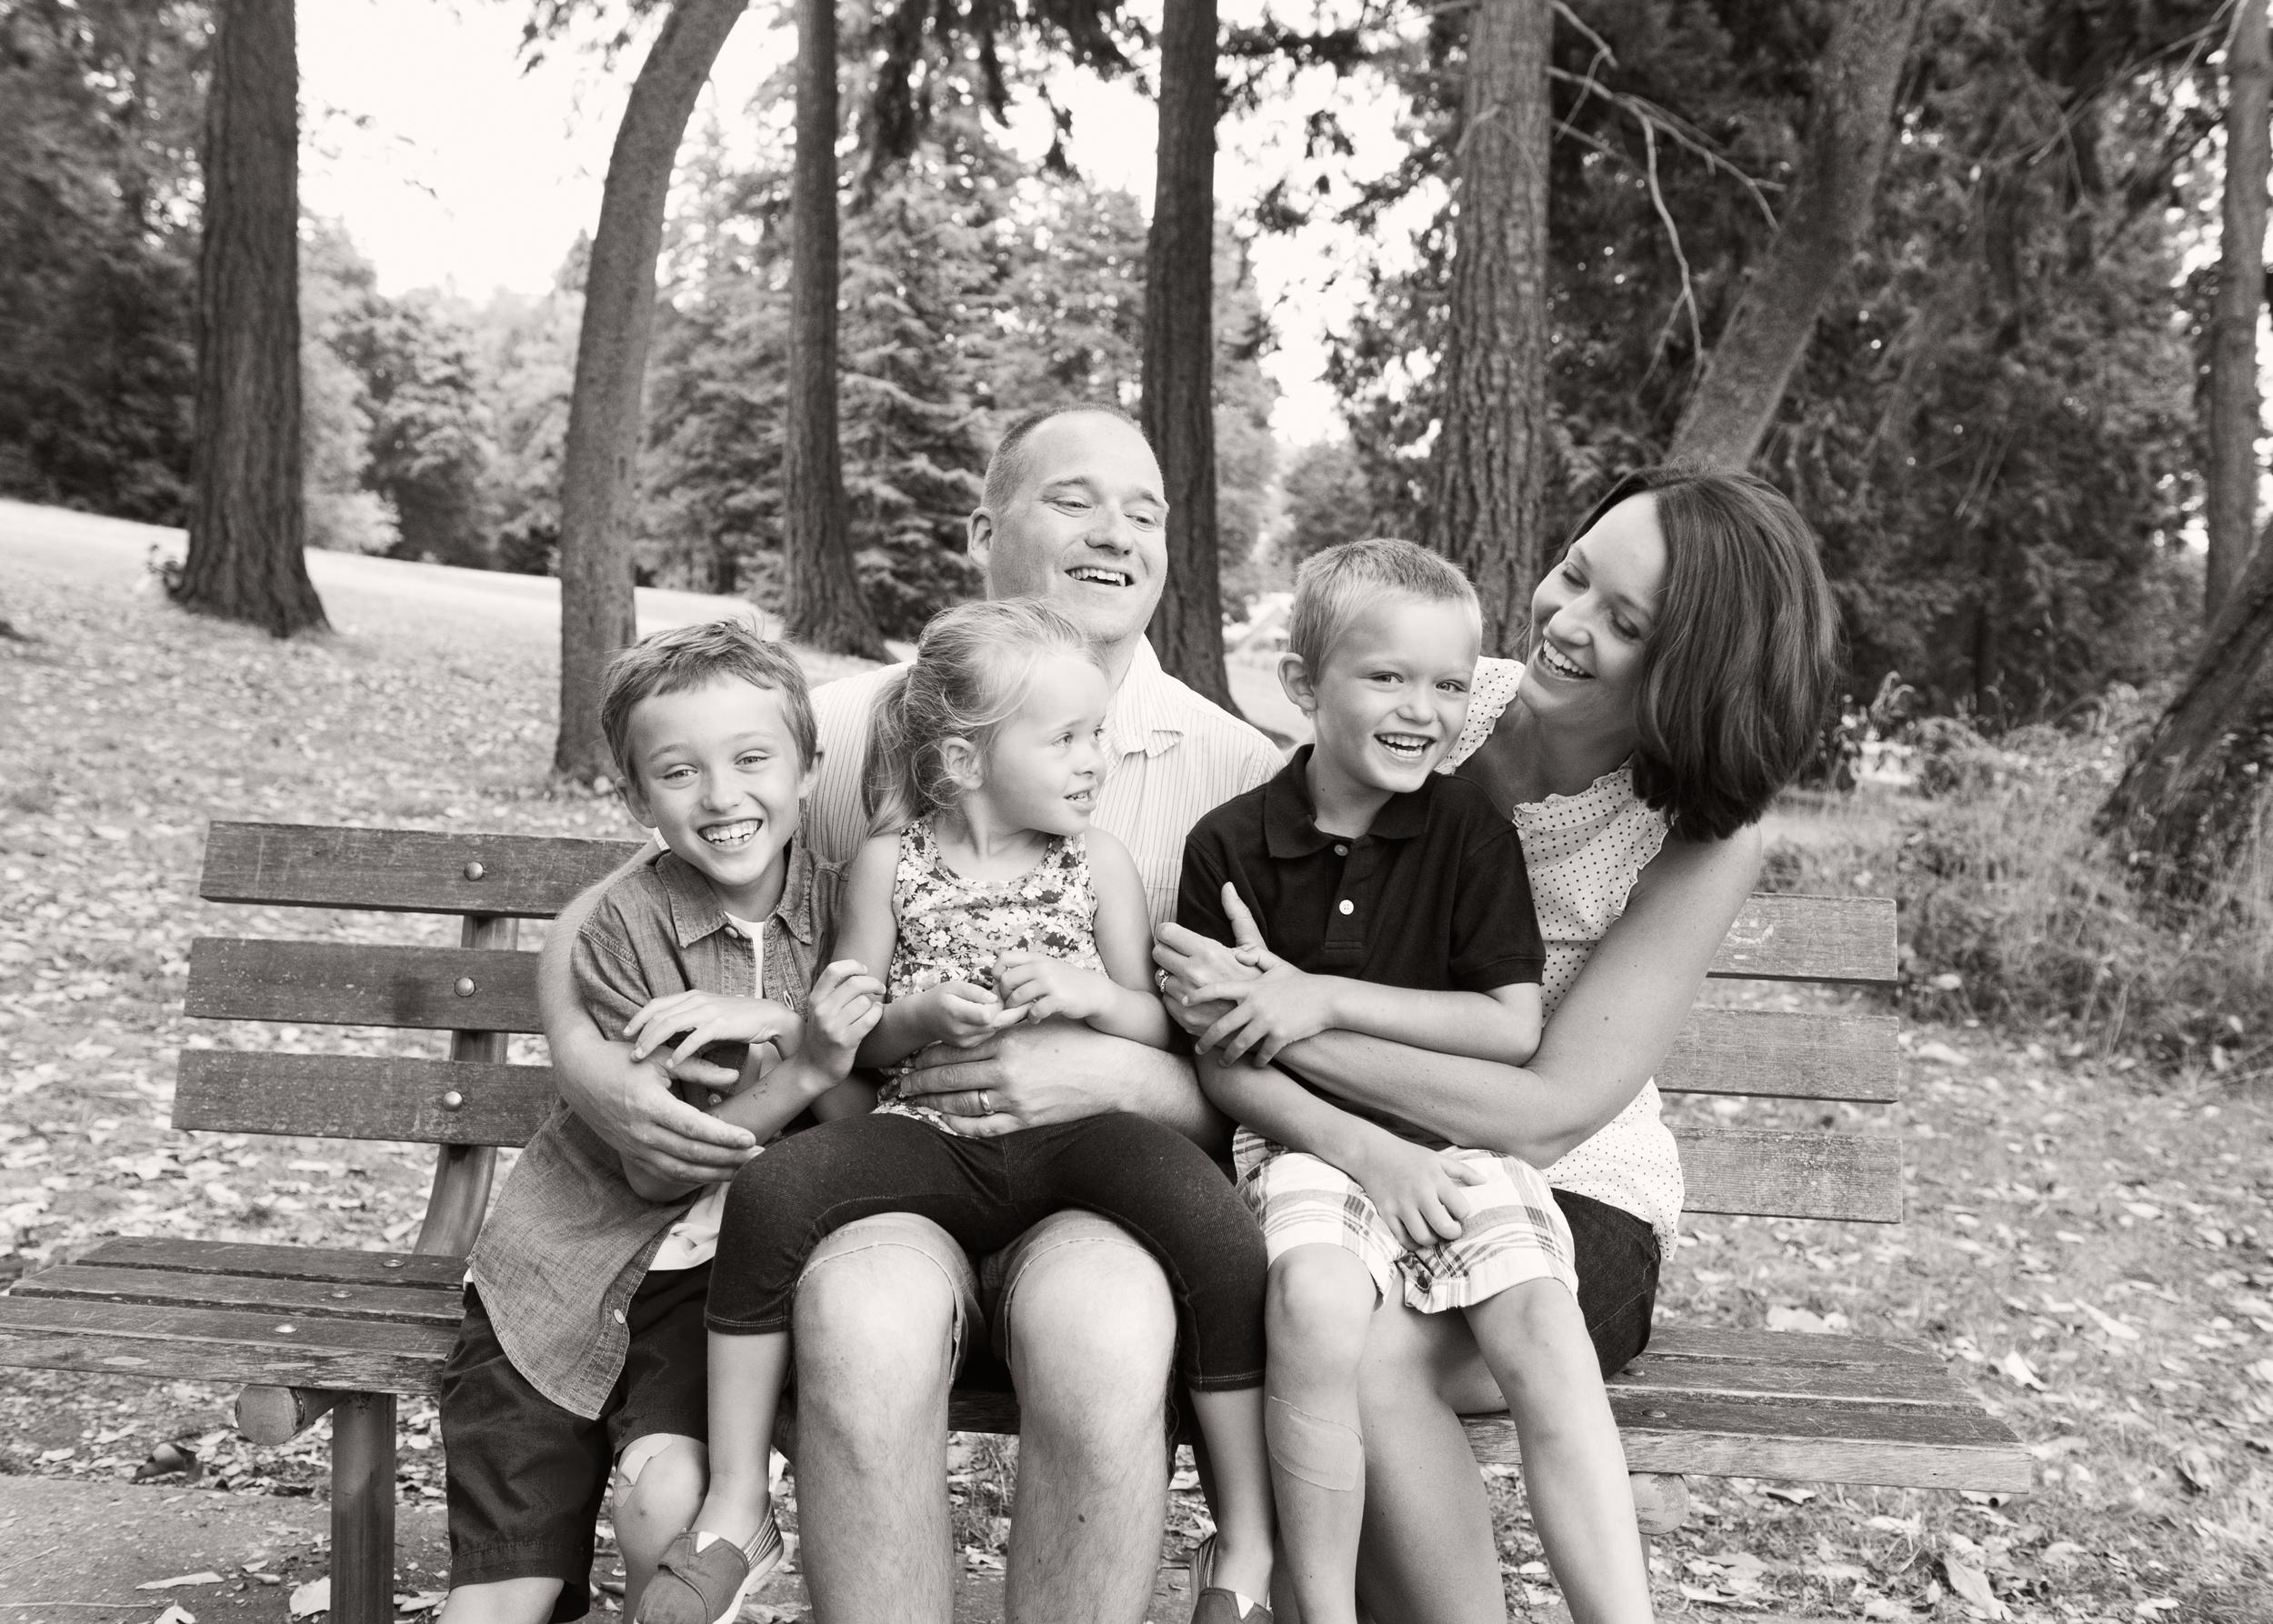 seattle-family-portrait-photographer-23.jpg